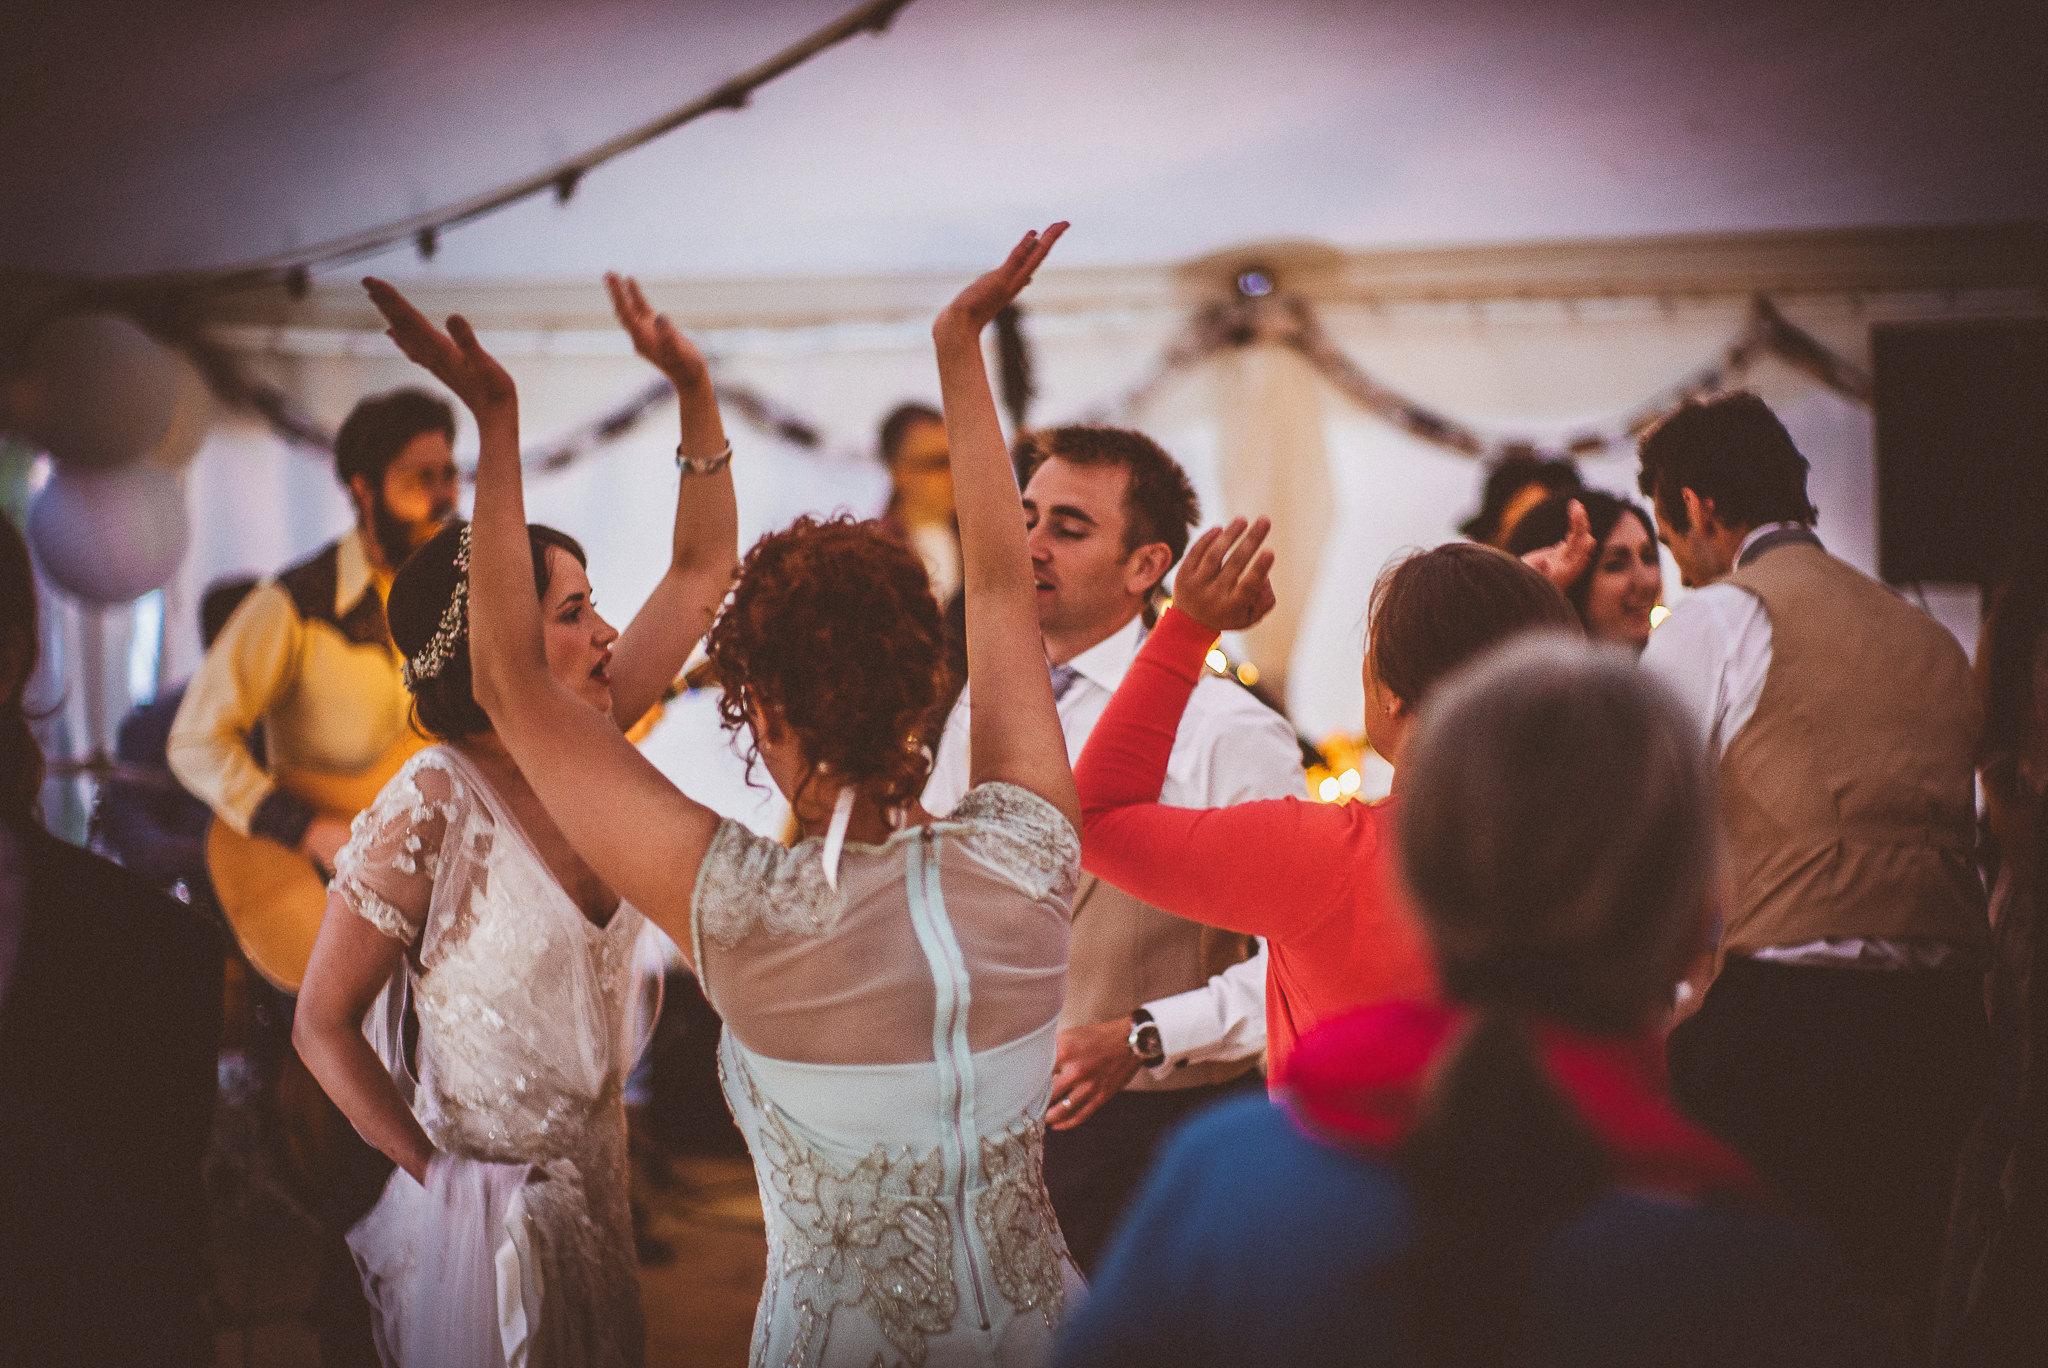 paul-marbrook-Farm-Wedding-Photographer-Lancashire-90105